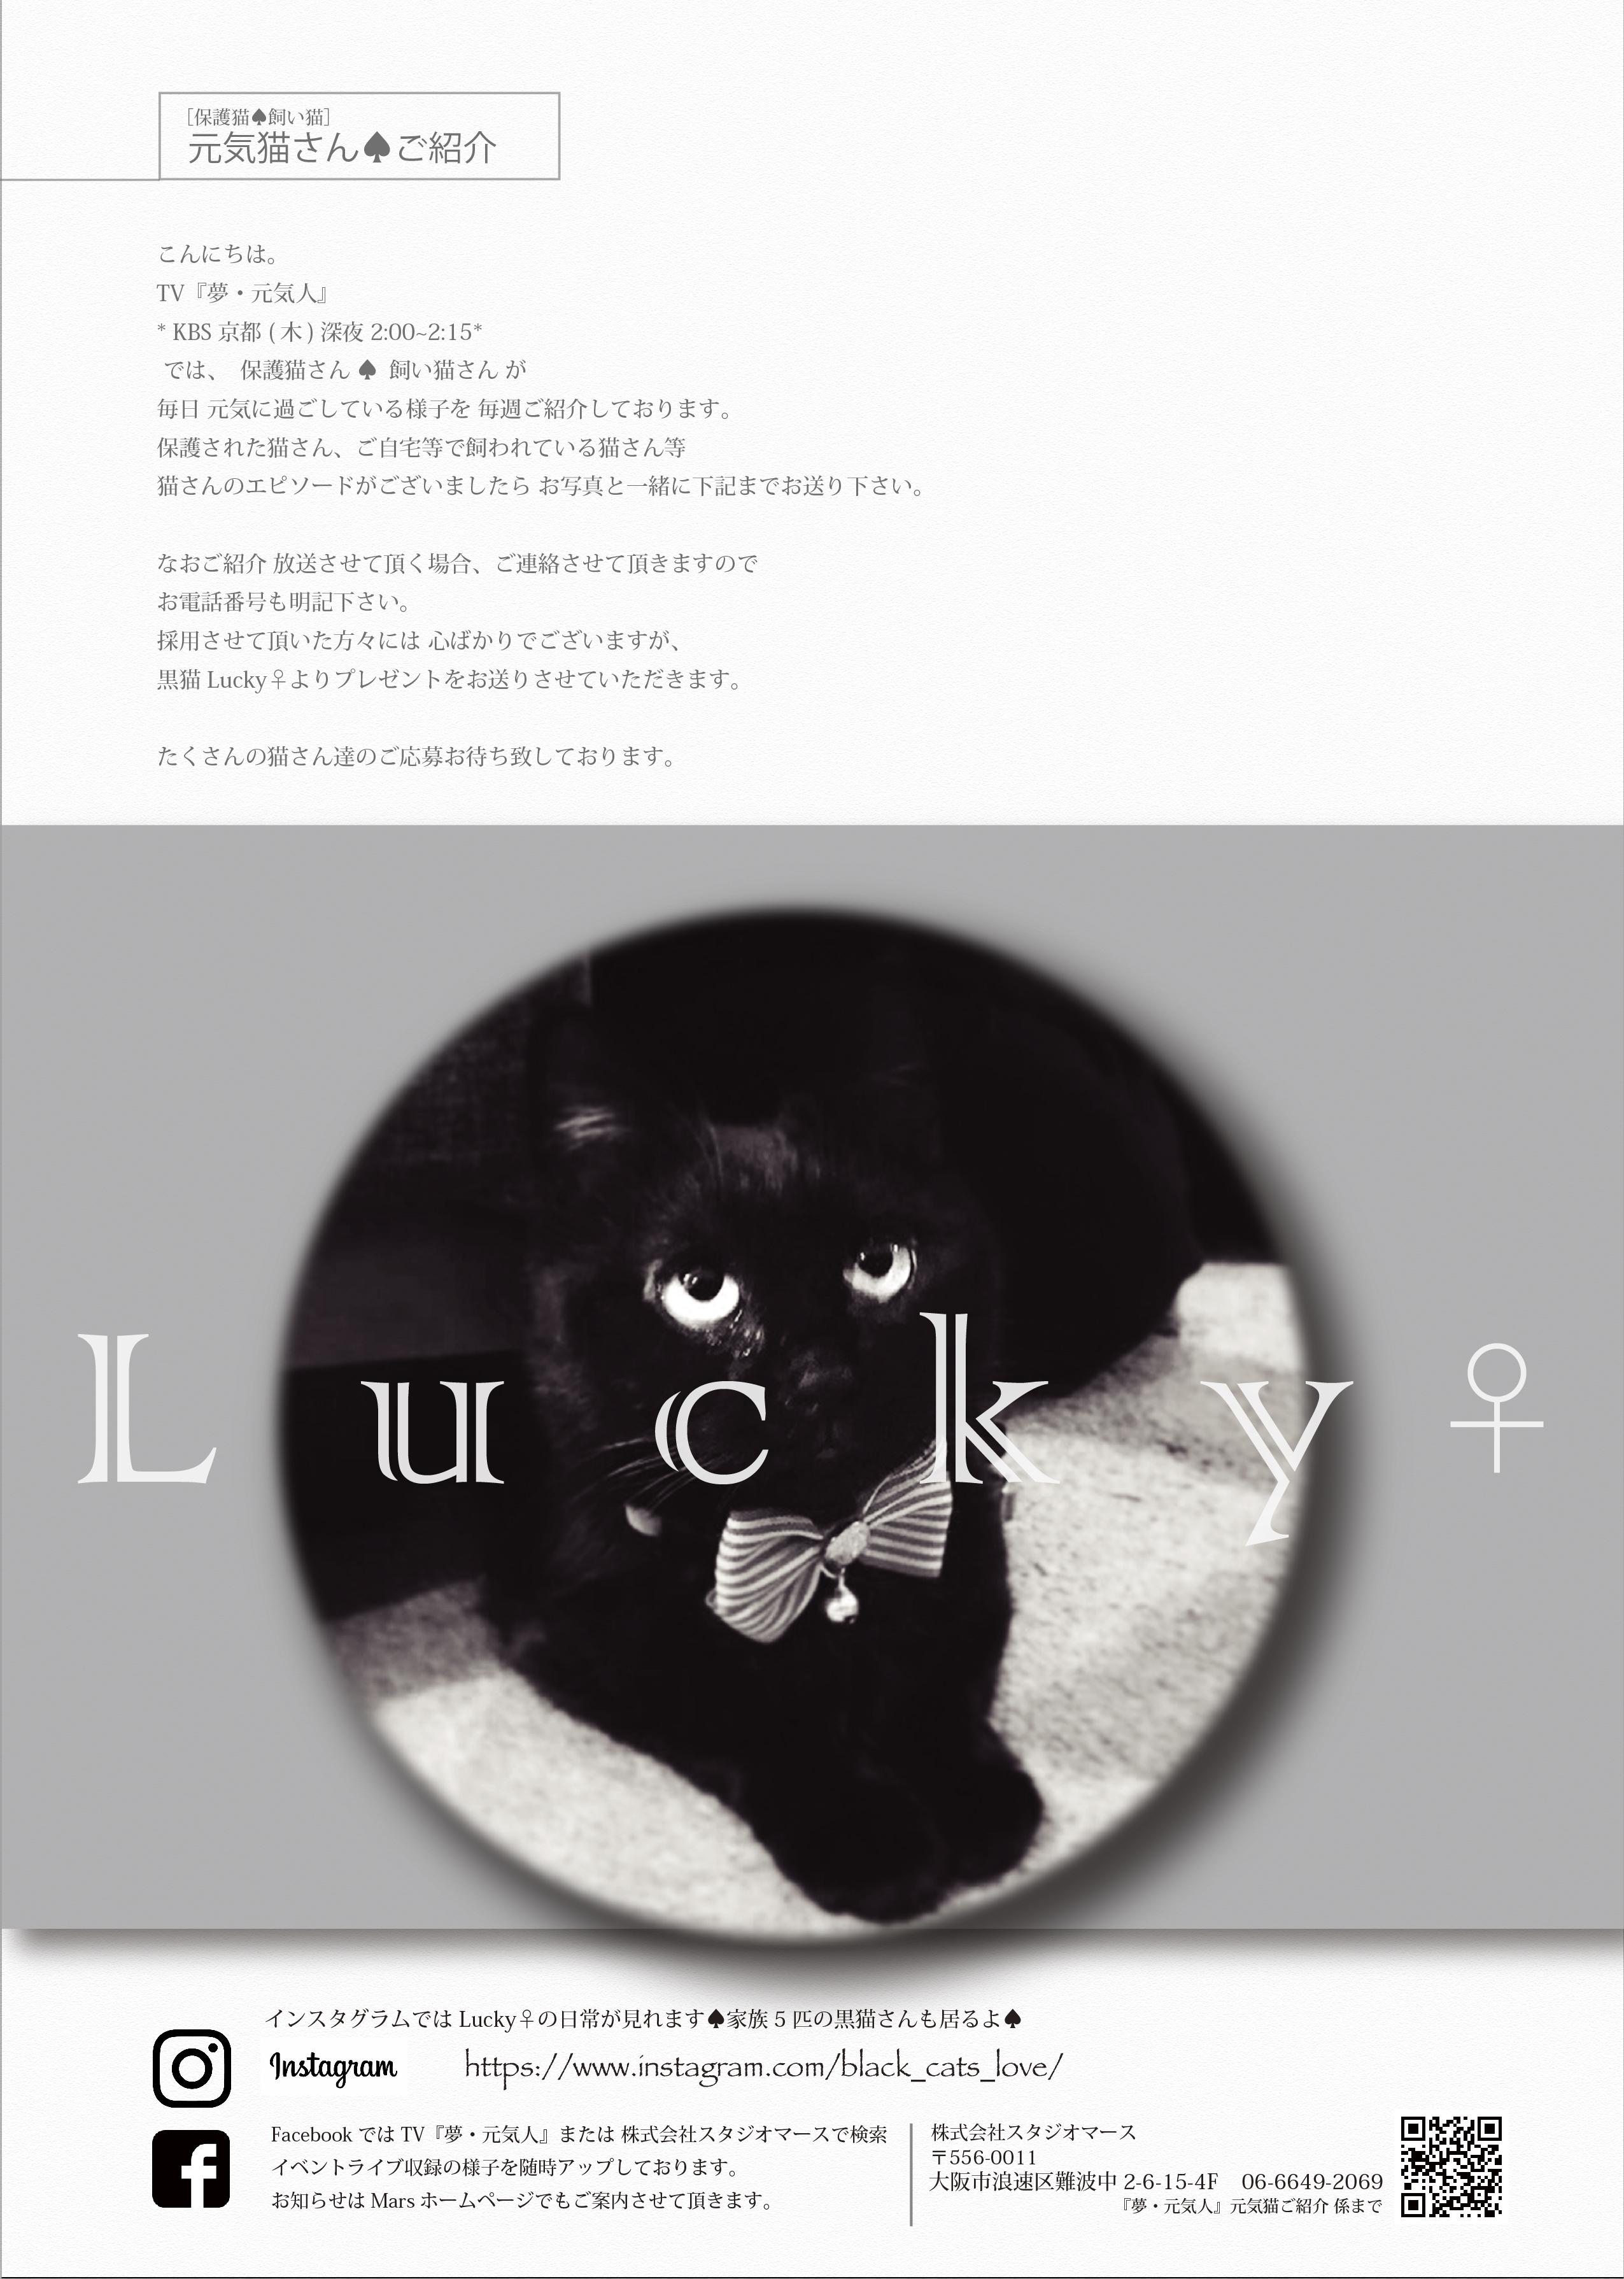 lucky-yumegennki-01.jpg